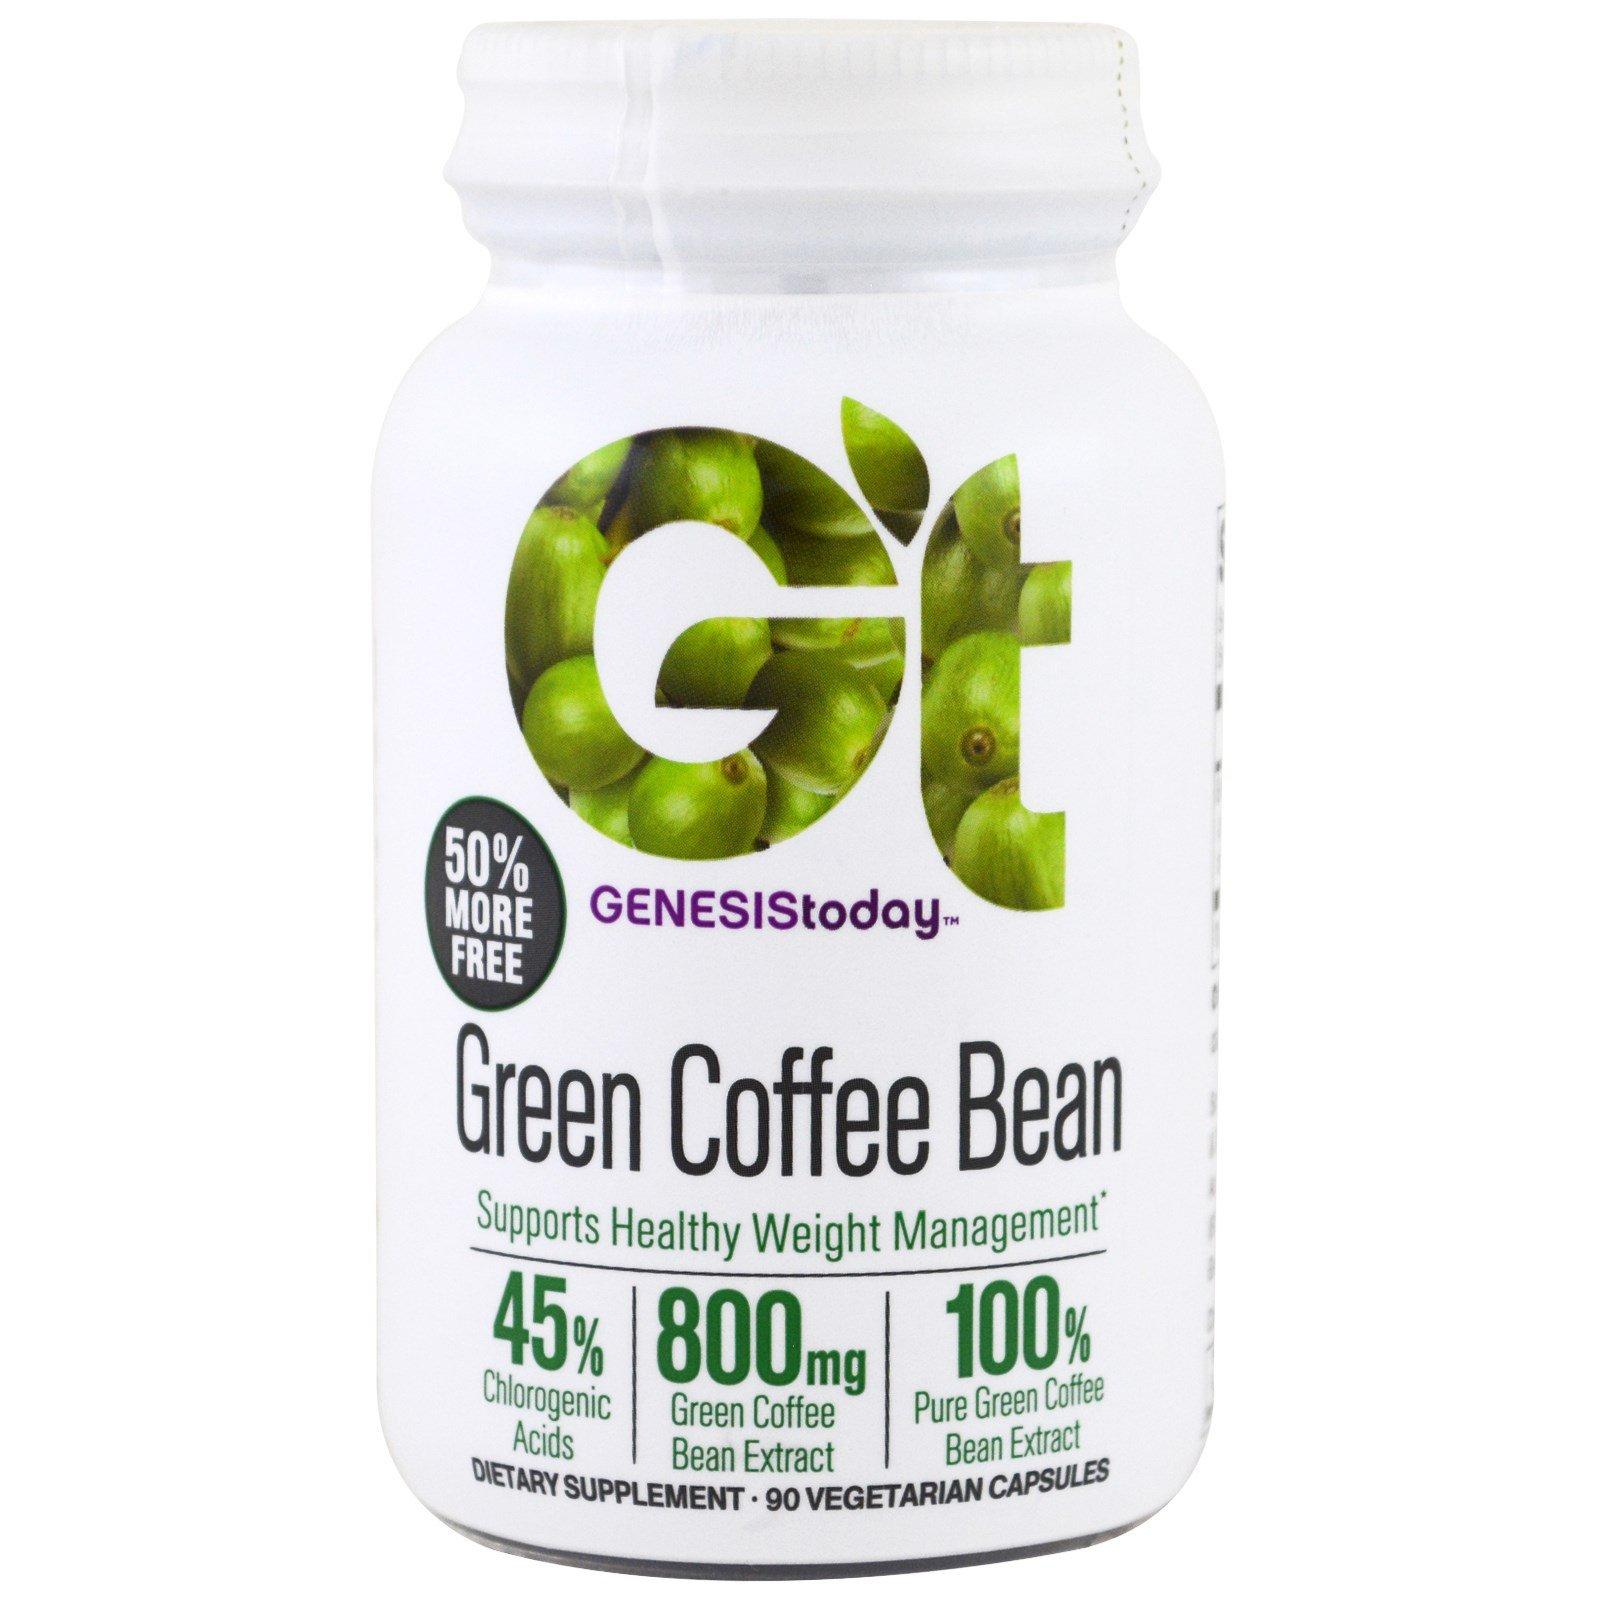 Genesis Today, The Original Green Coffee Bean, 60 Veggie Caps - 3PC